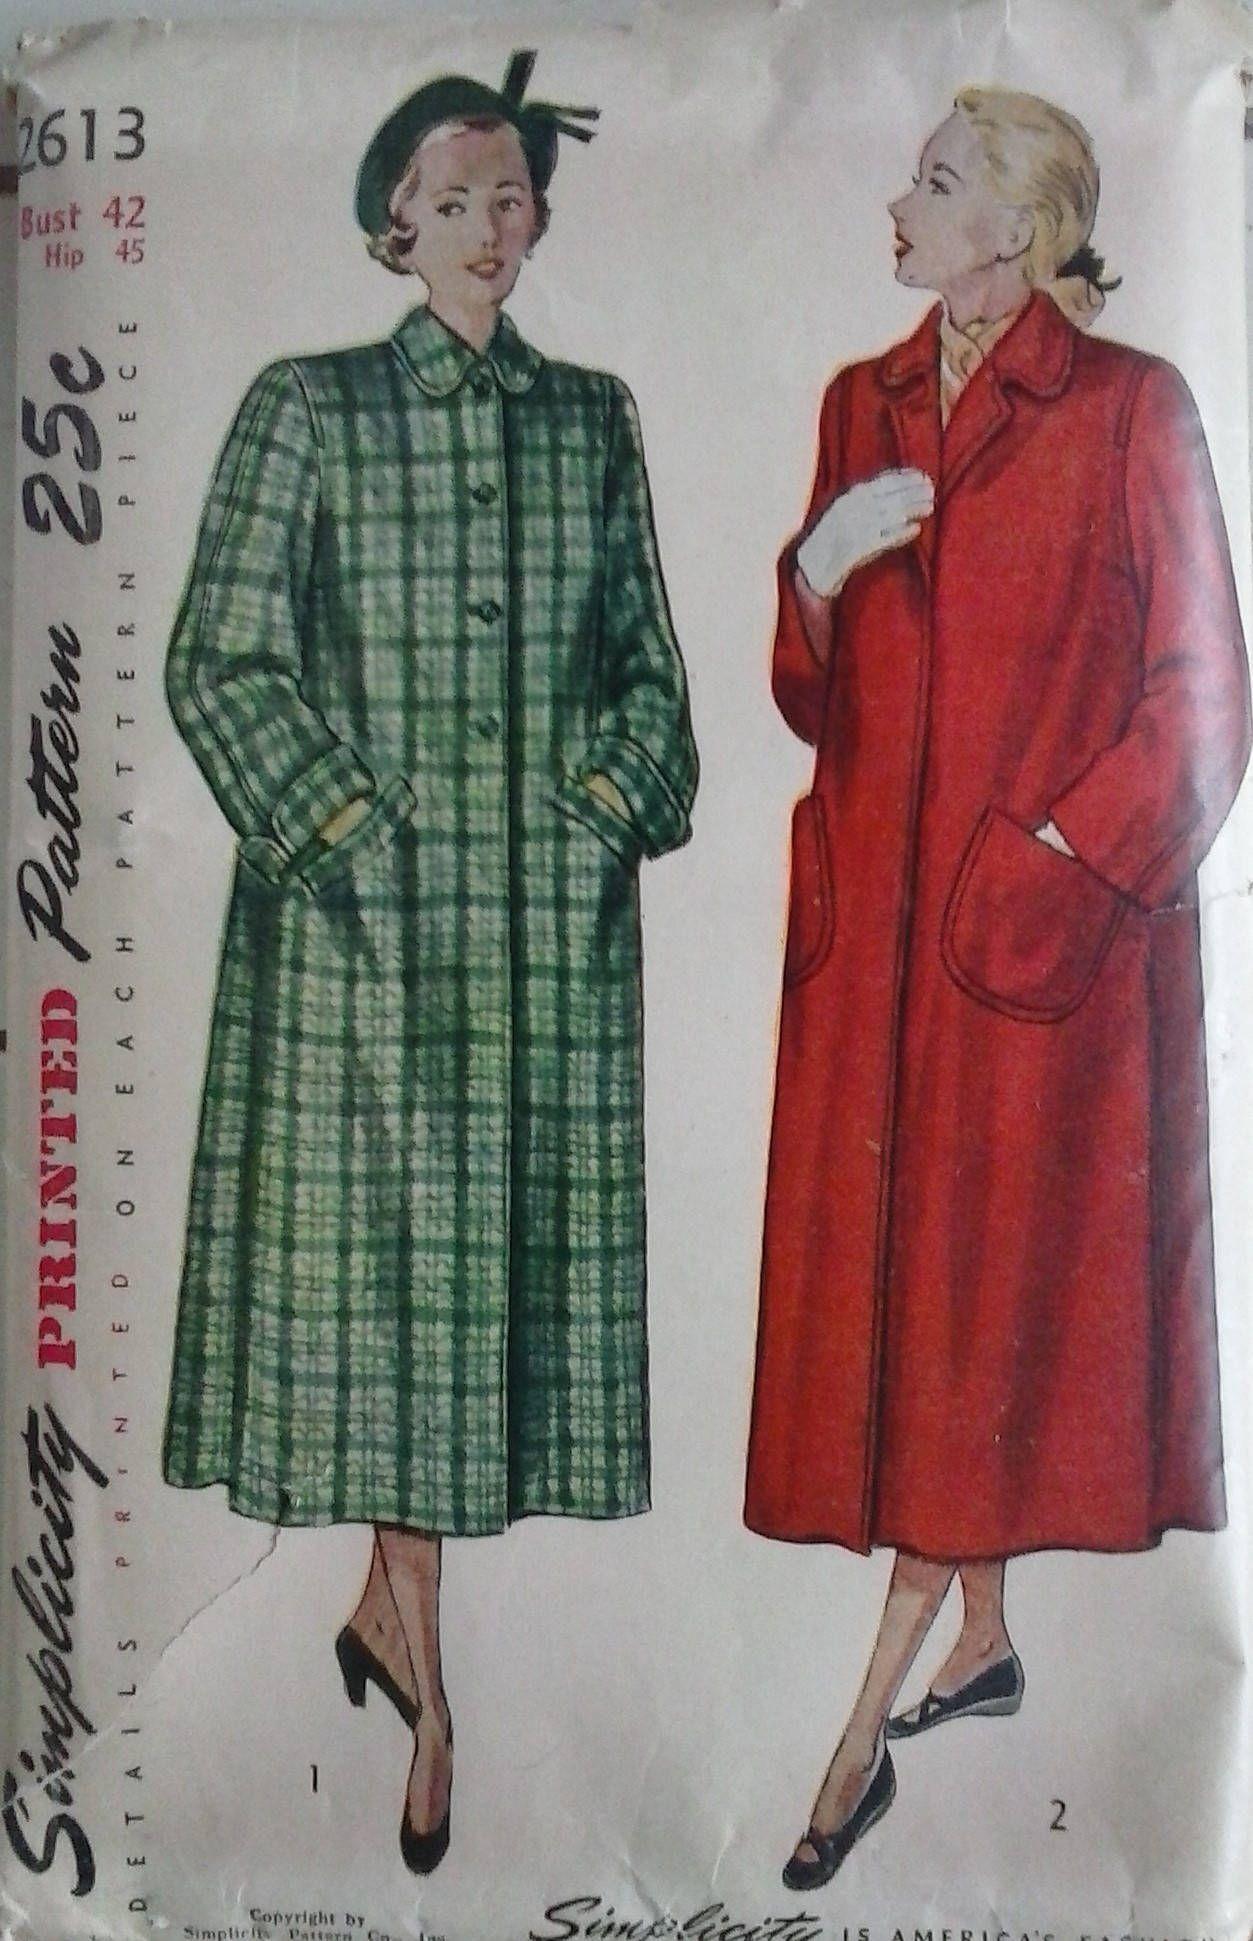 Simplicity ladies coat pattern 2613 vintage 1948 long coat simplicity ladies coat pattern vintage 1948 long coat pattern by craftymjc on etsy jeuxipadfo Choice Image